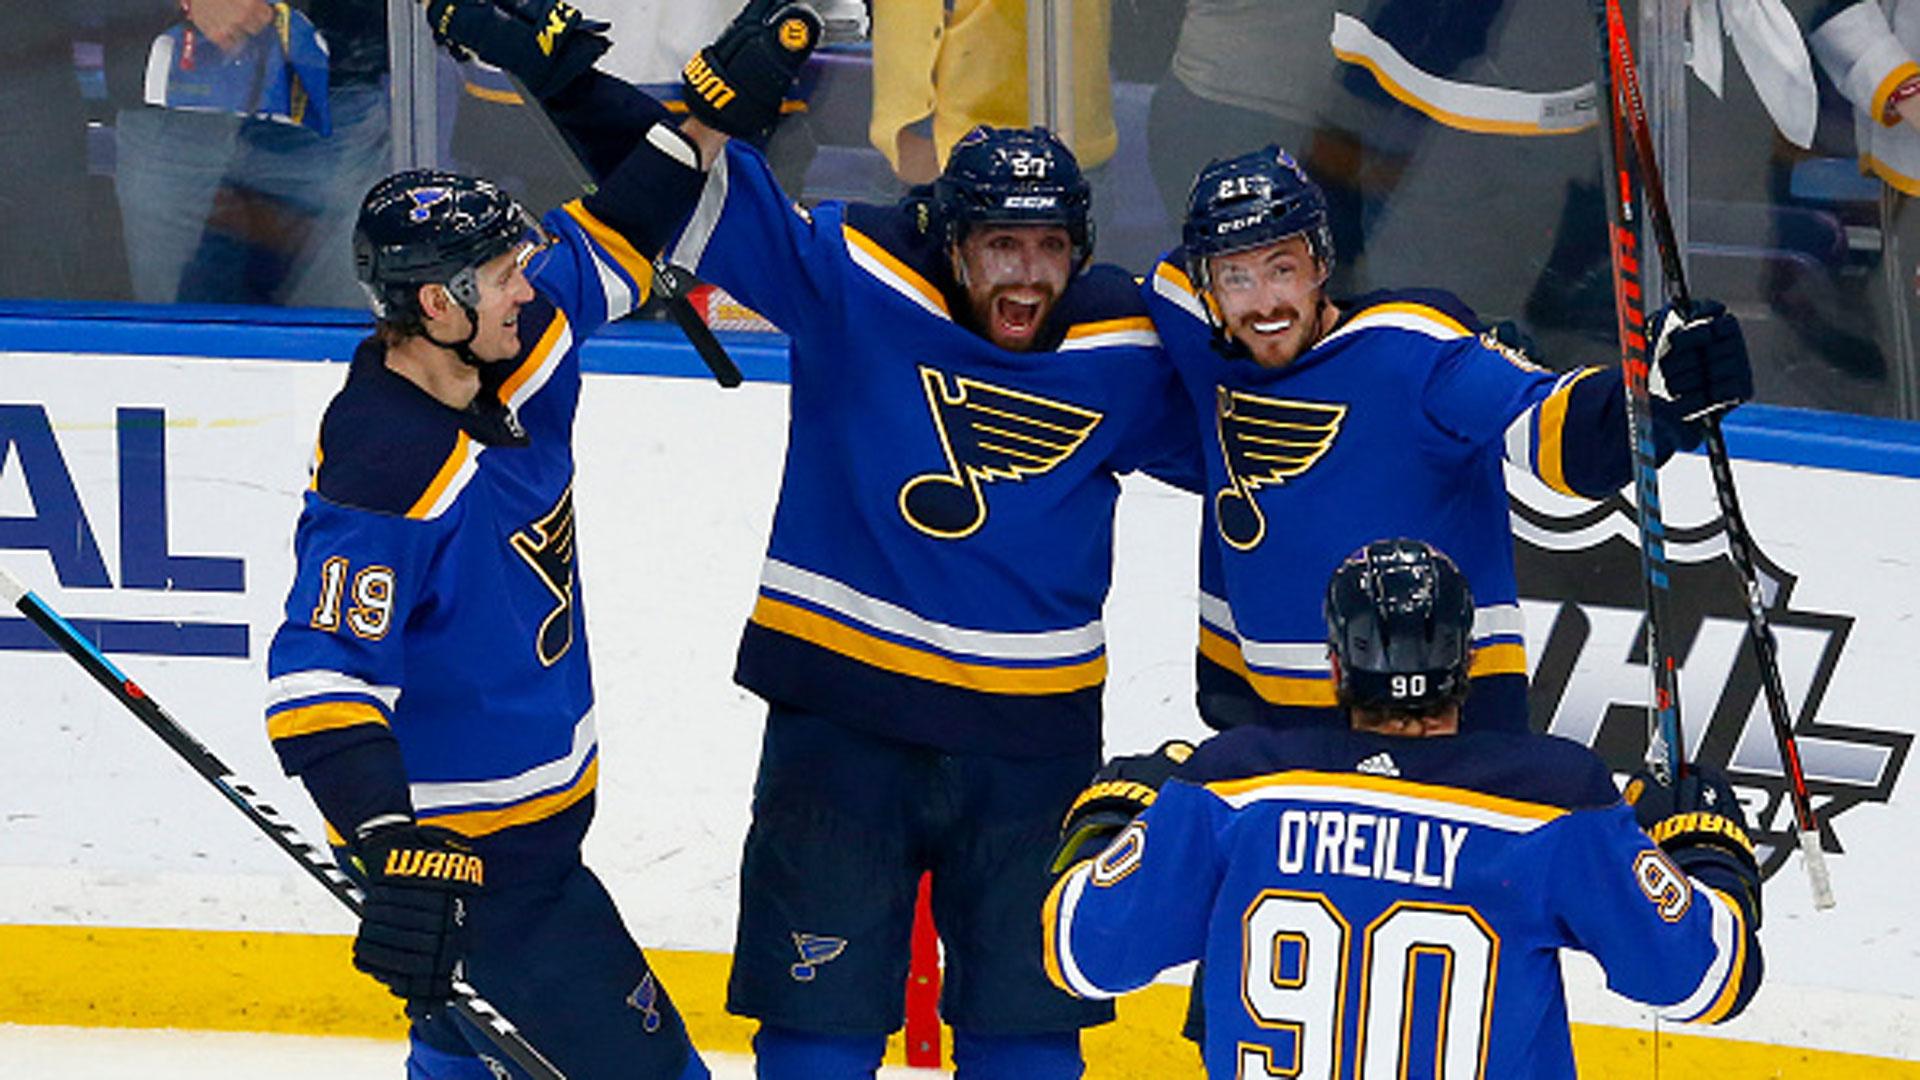 Blues reach Stanley Cup Final after unprecedented season turnaround